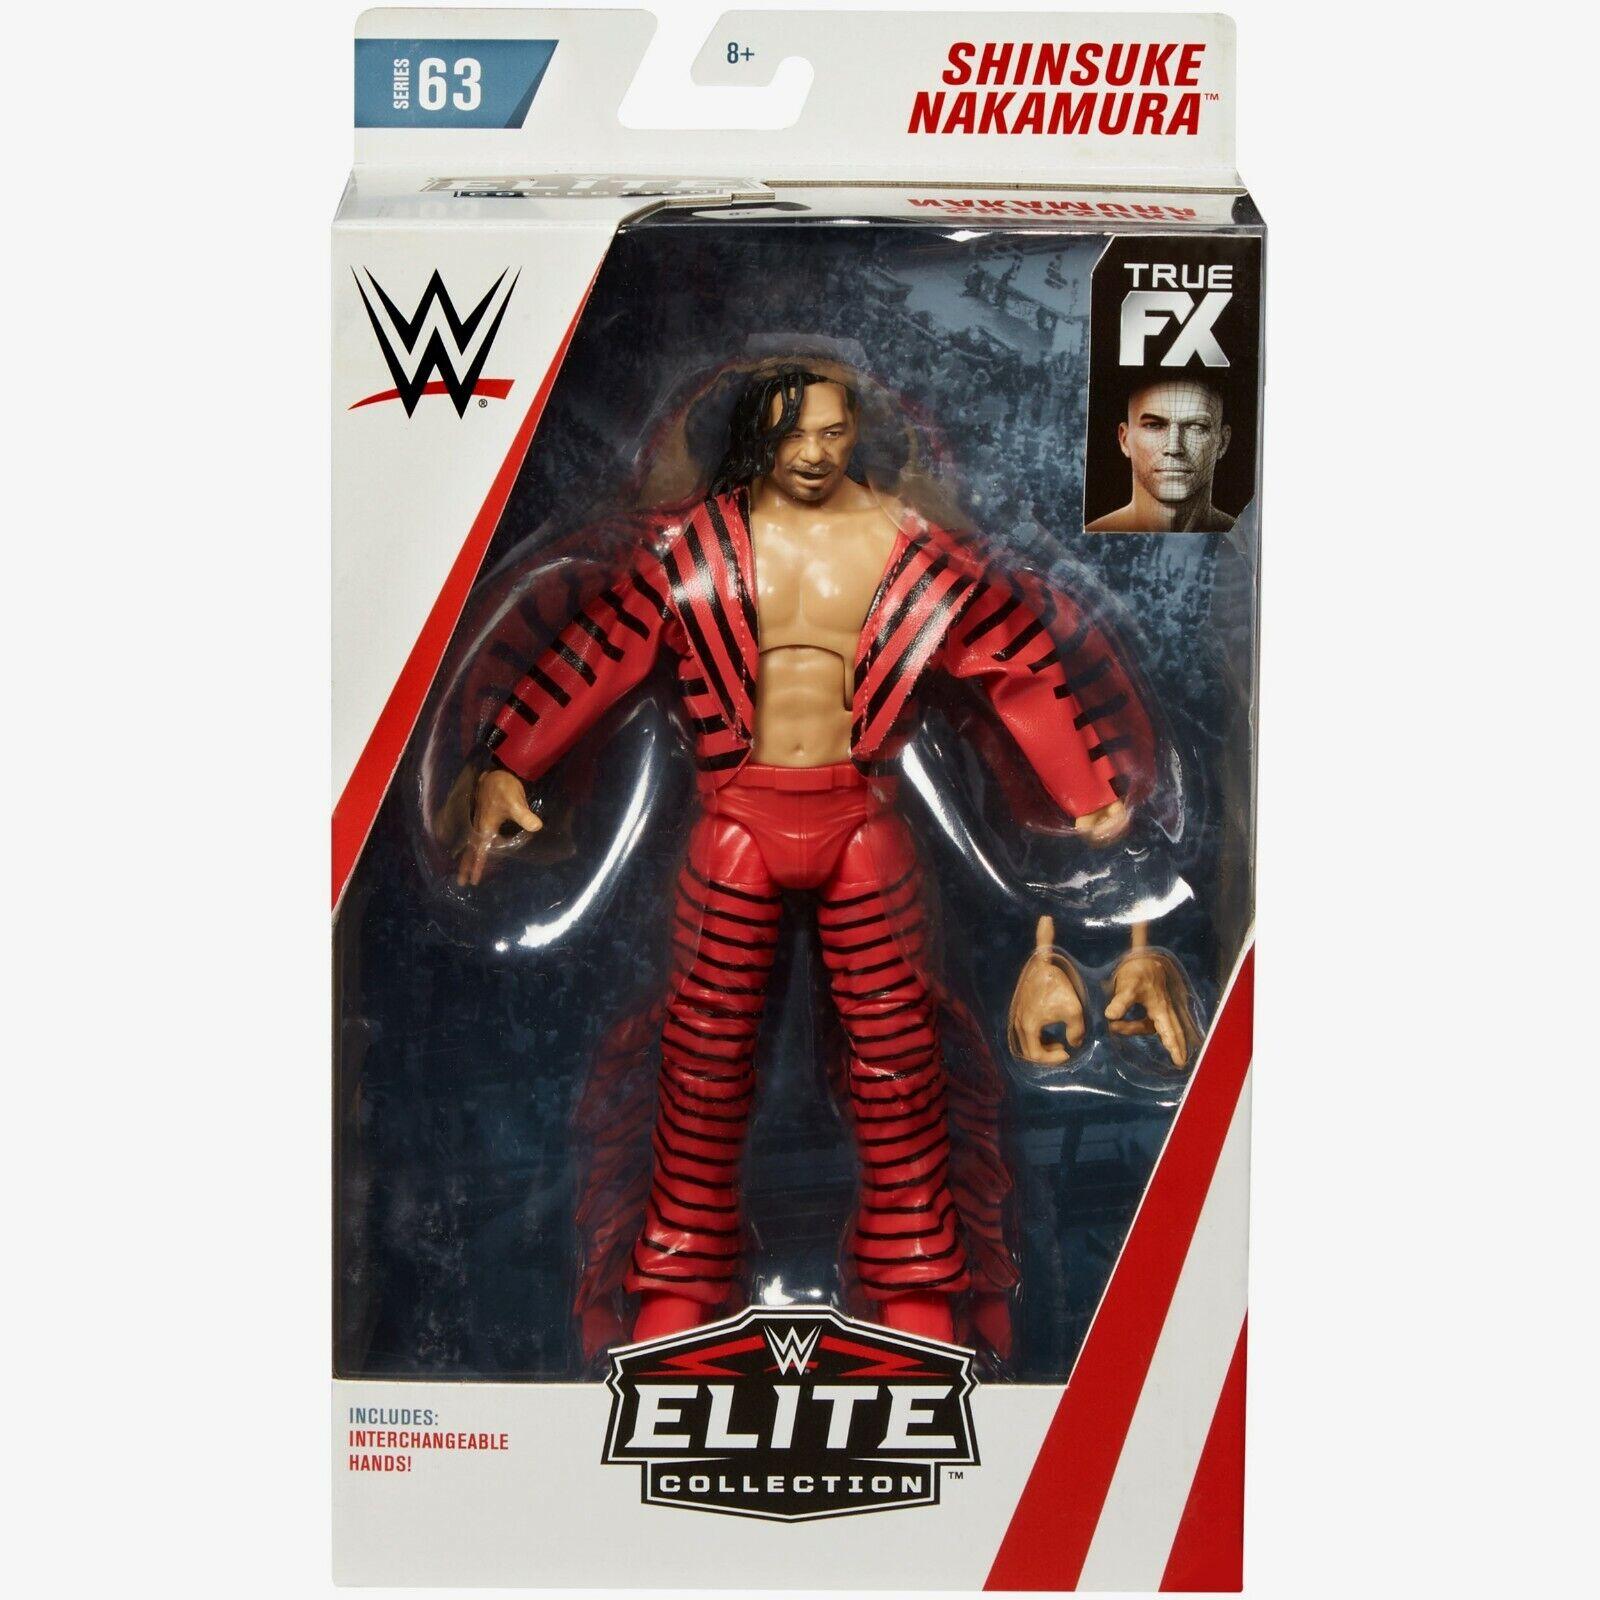 WWE Elite Collection Series 63 - Shinsuke Nakamura Figure BRAND NEW